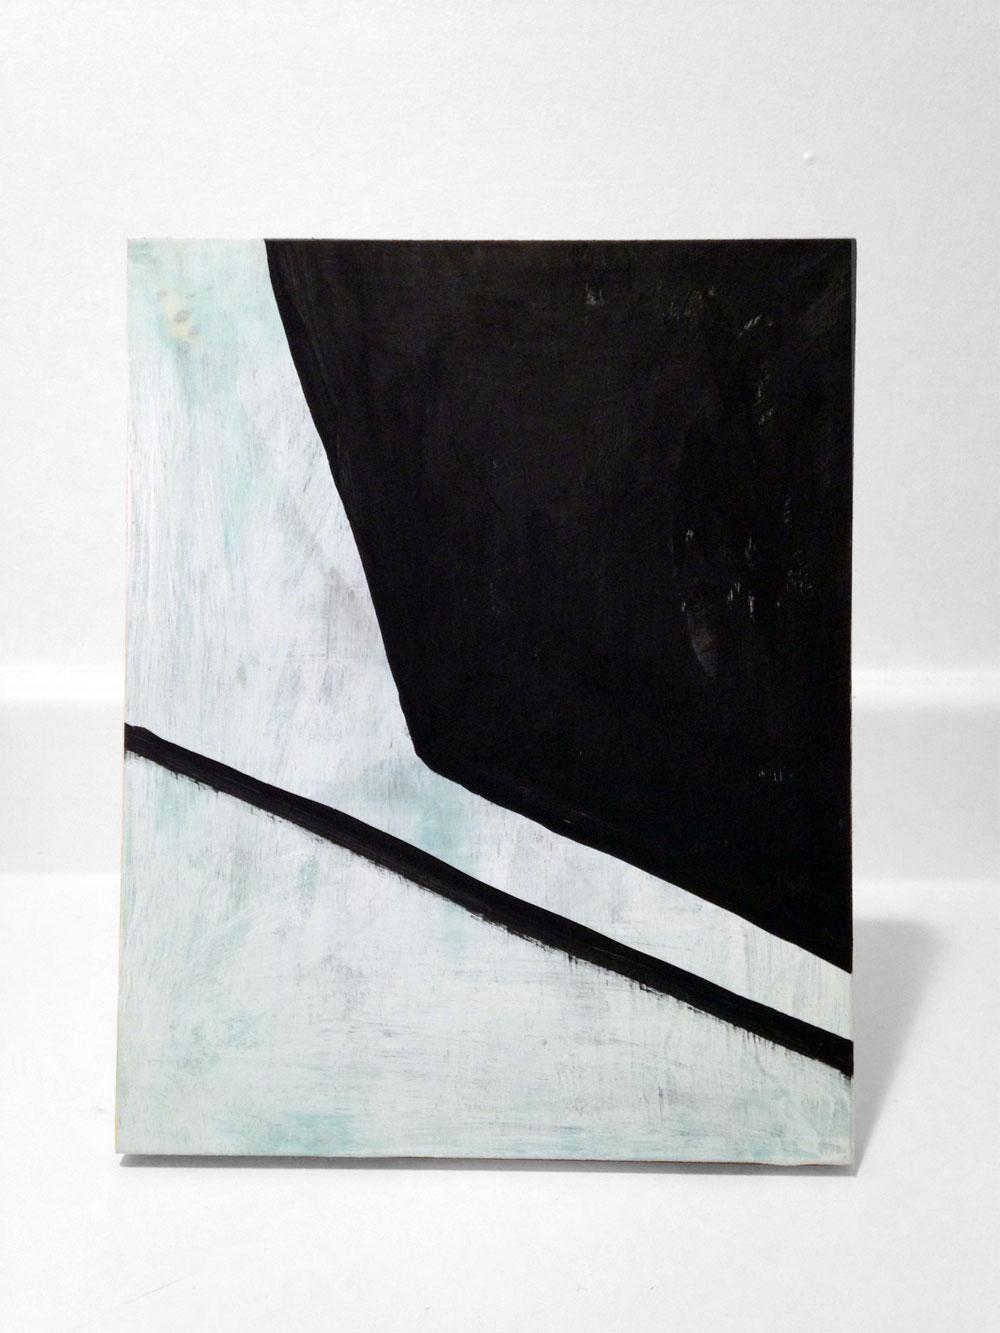 Moss Angle 8x10 Wood Panel by Edmond van der Bijl